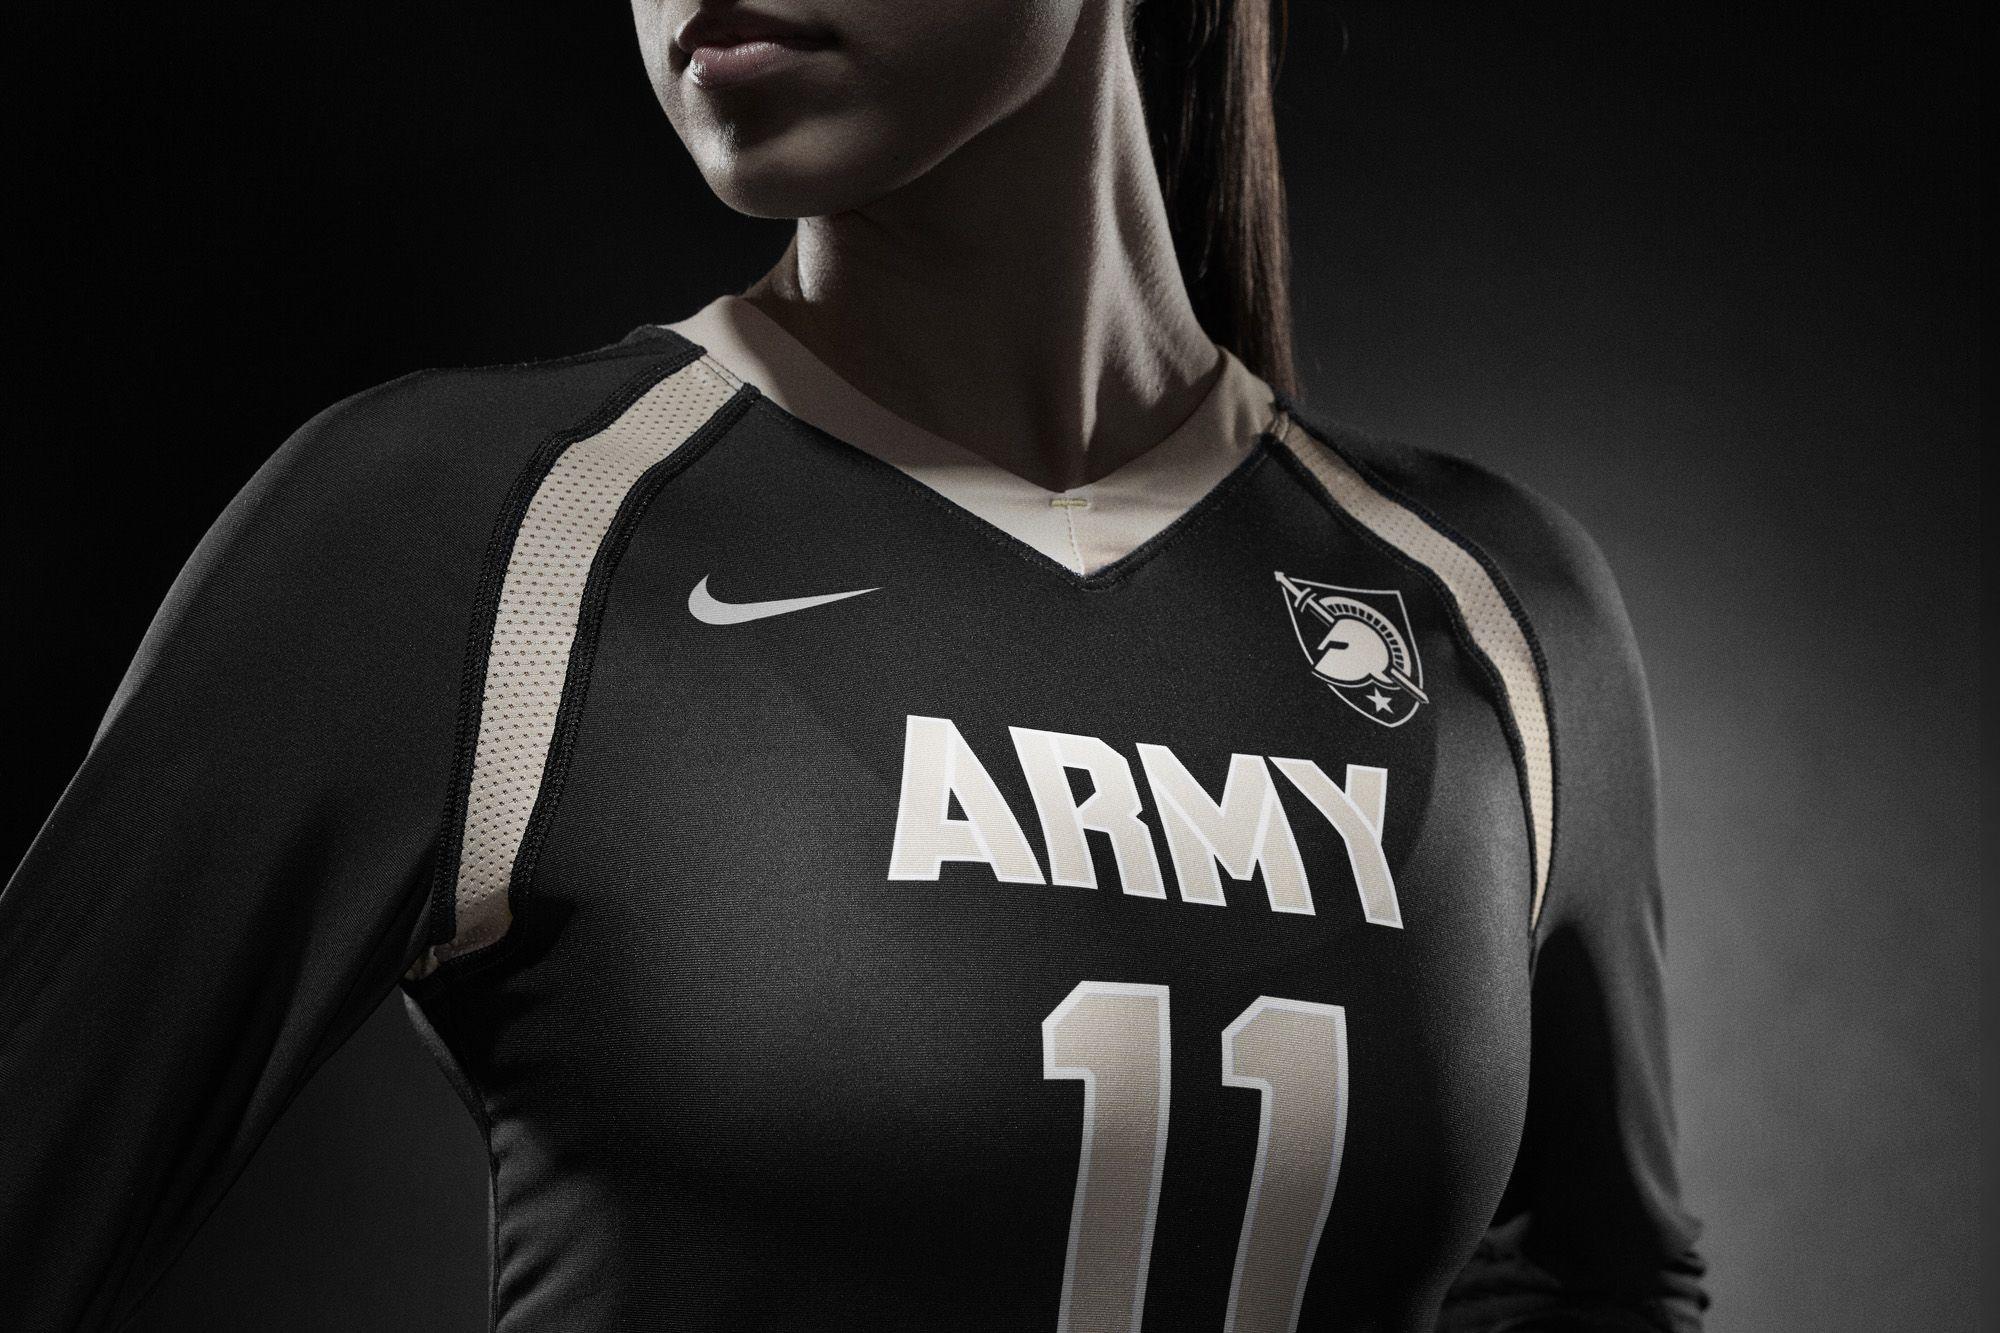 Army West Point West Point Army West Point Uniform